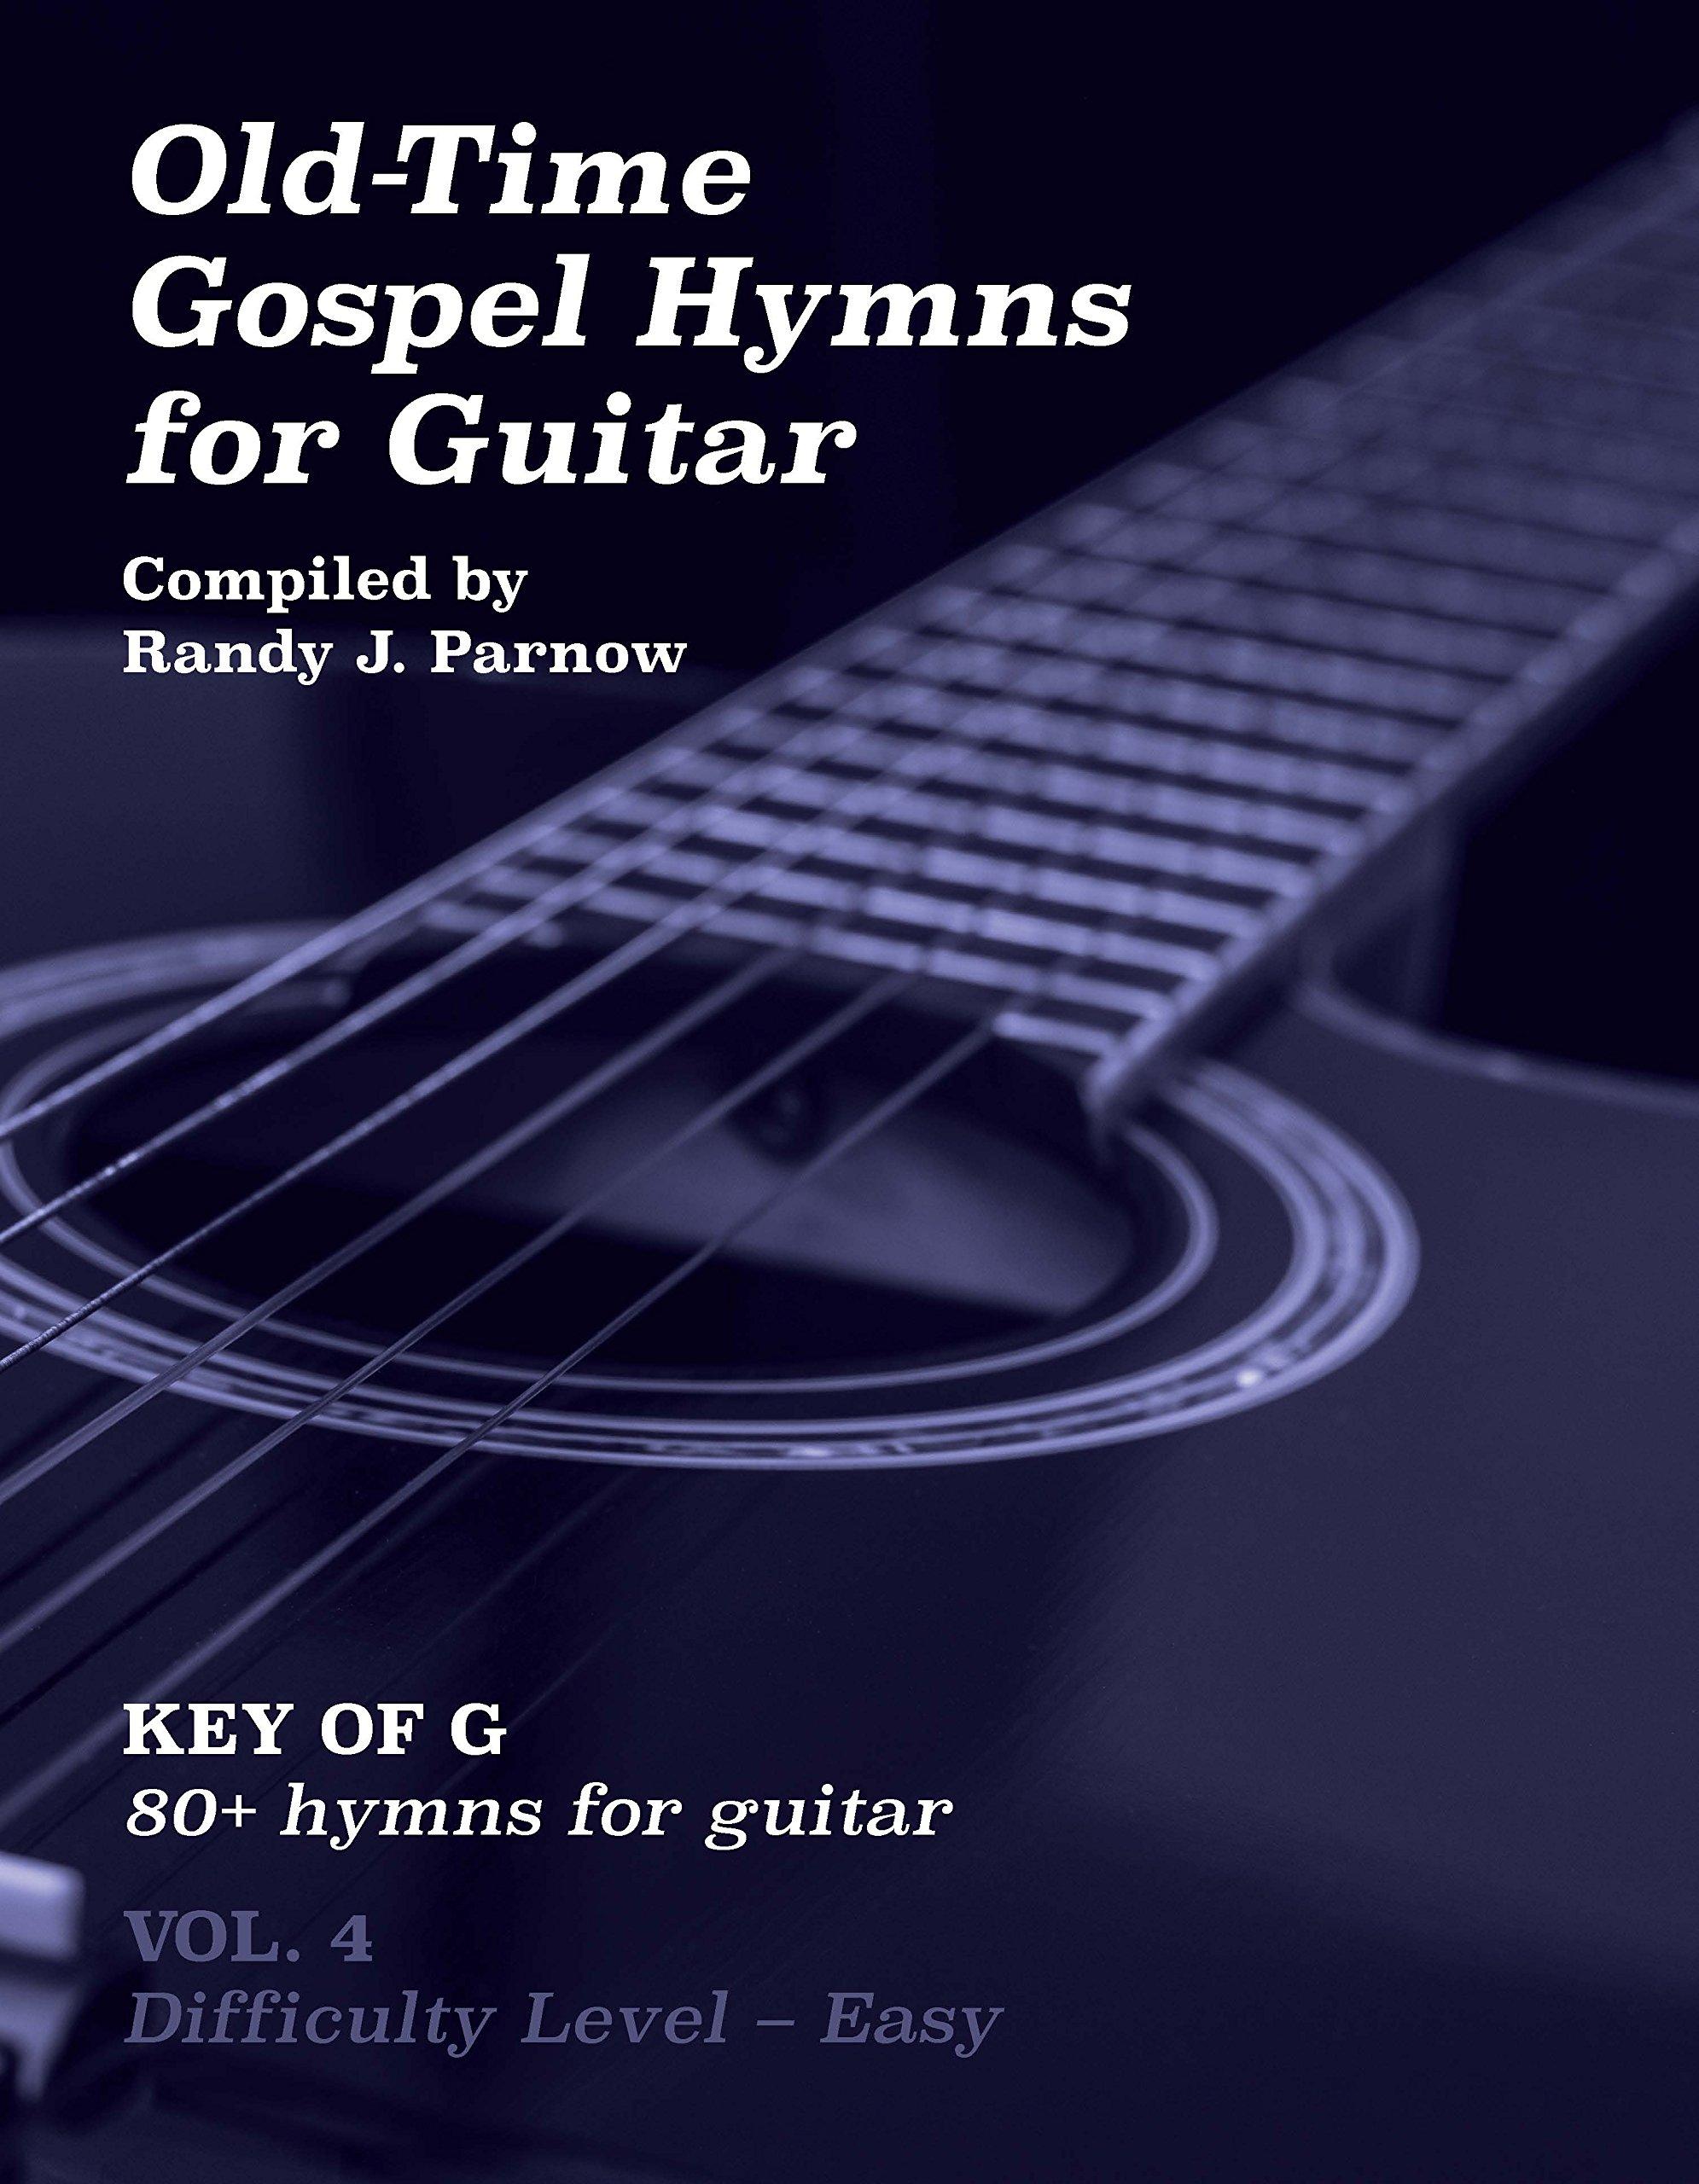 Volume 4 Old Time Gospel Hymns For Guitar Key Of G Randy J